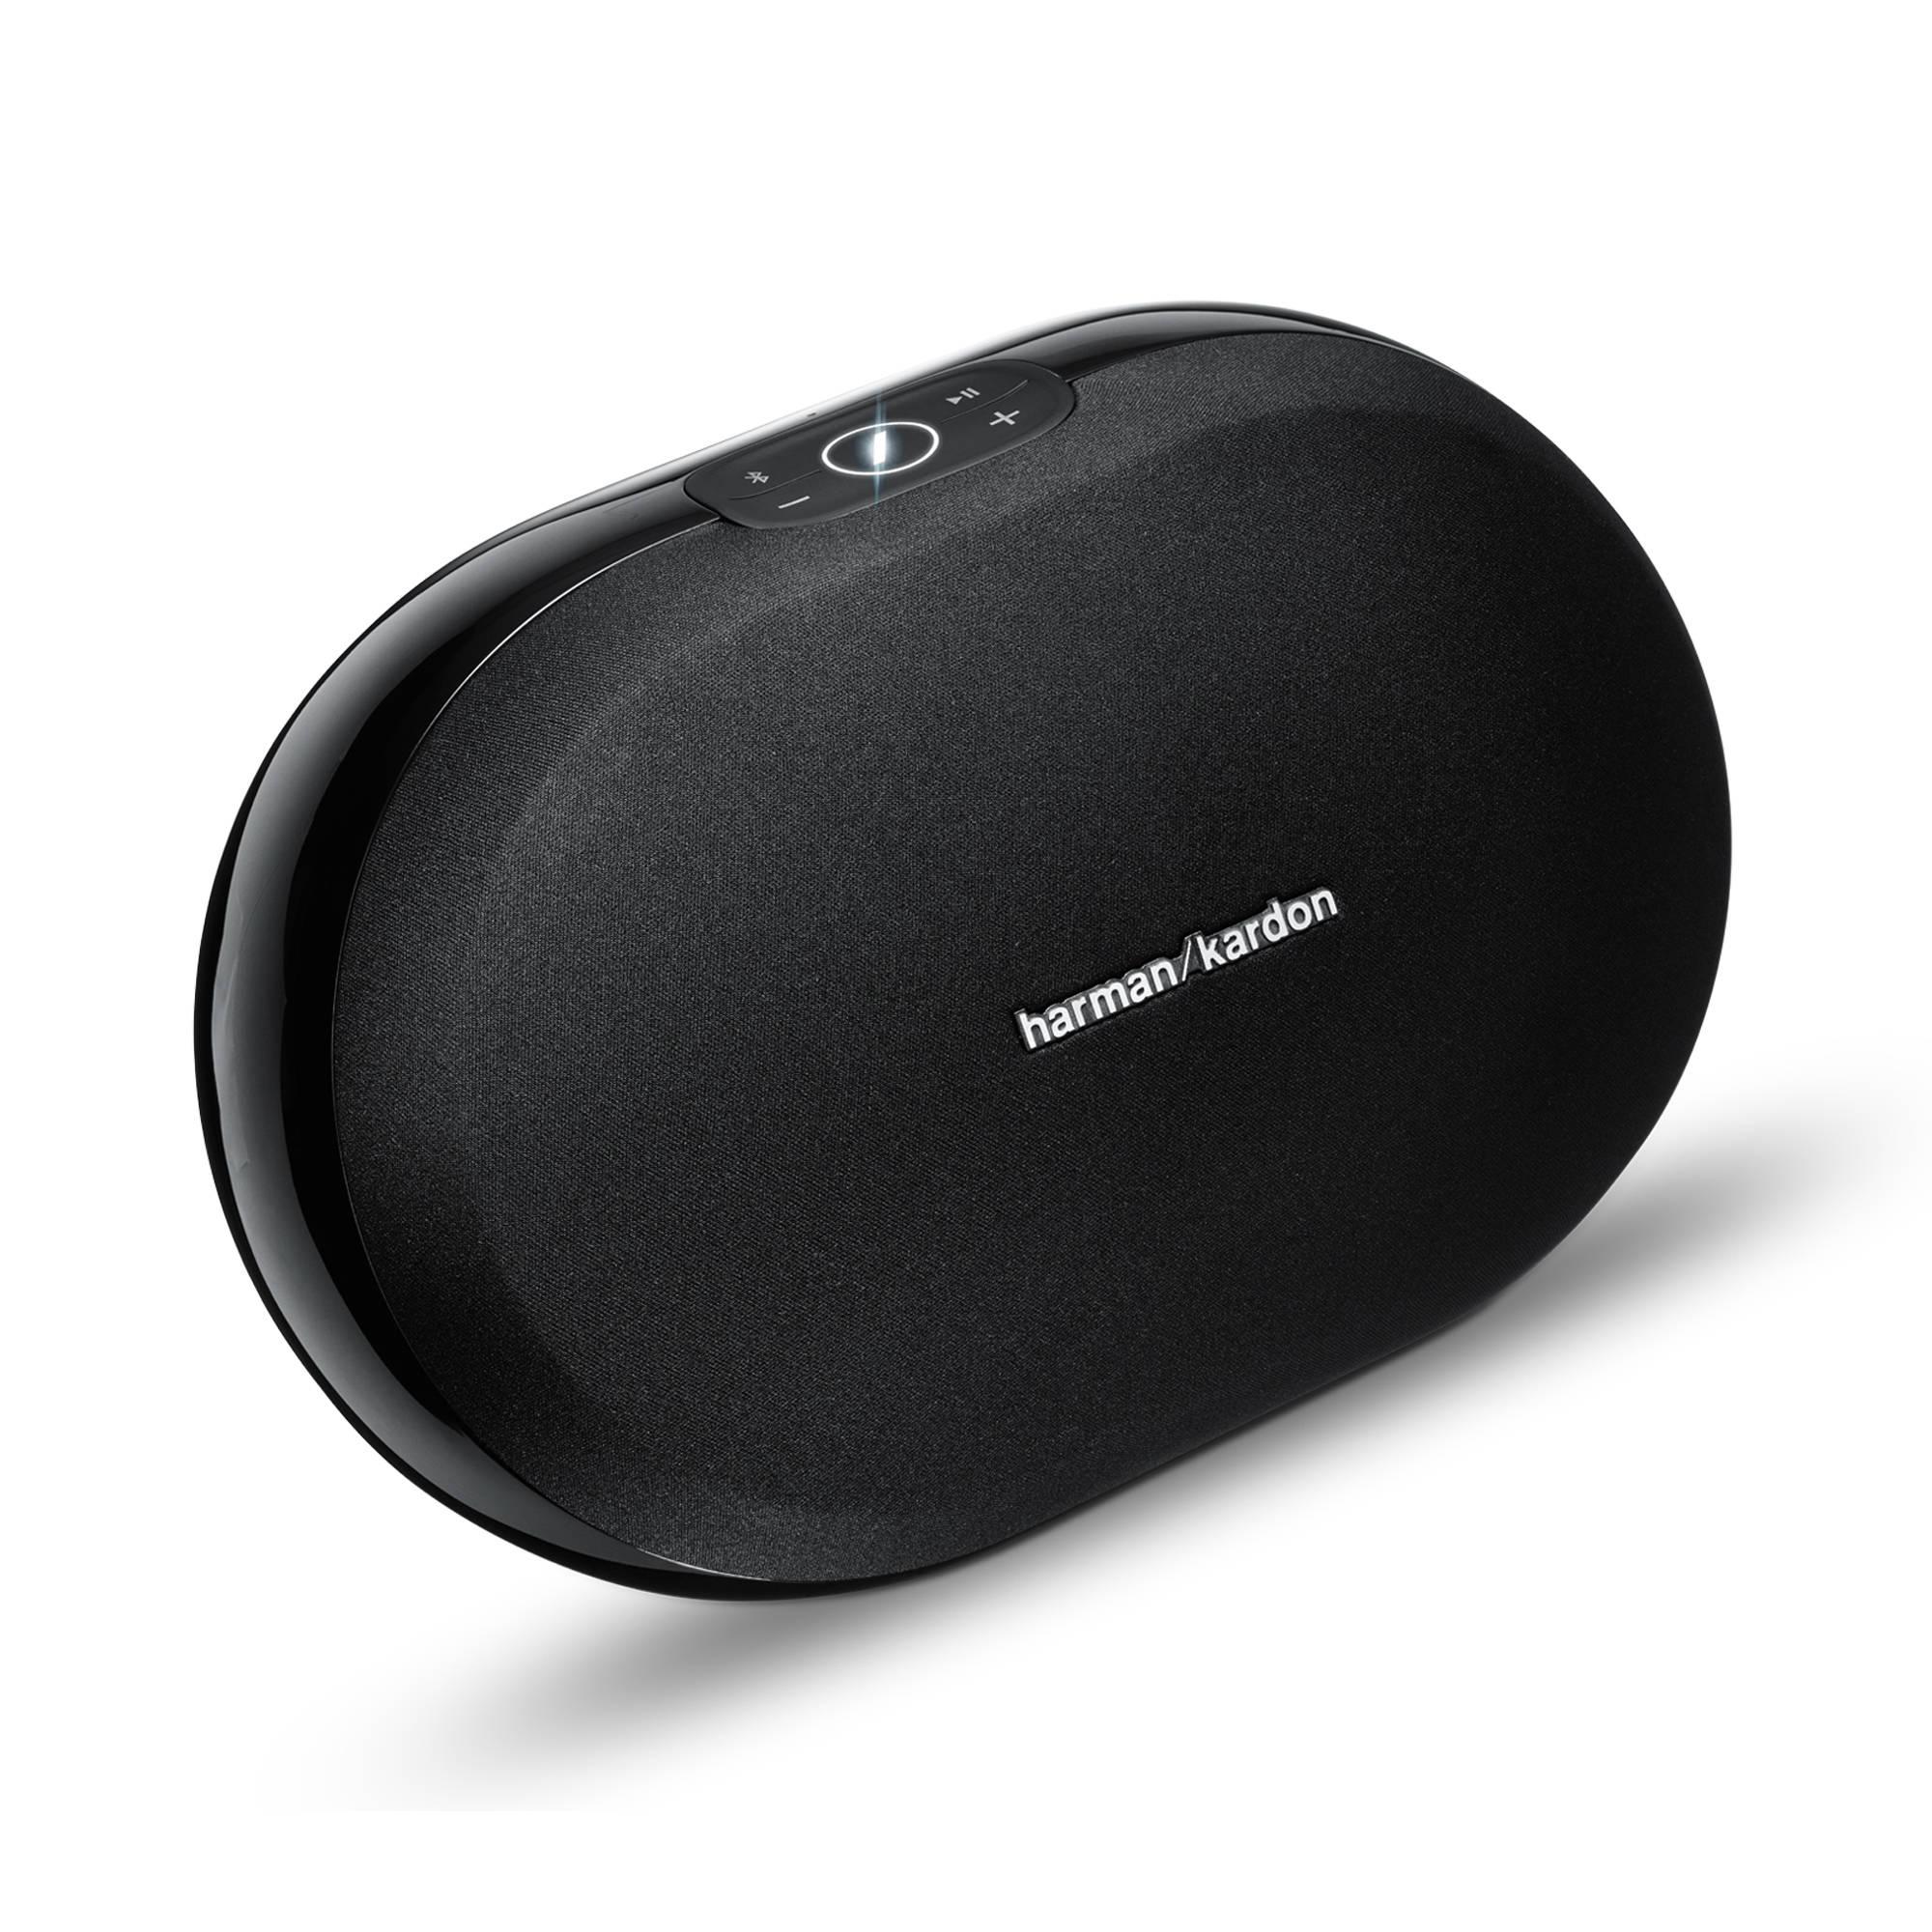 e0ed10bf018 B H Photo Video - Harman Kardon Omni 20 Wireless Hd Stereo Speaker ...